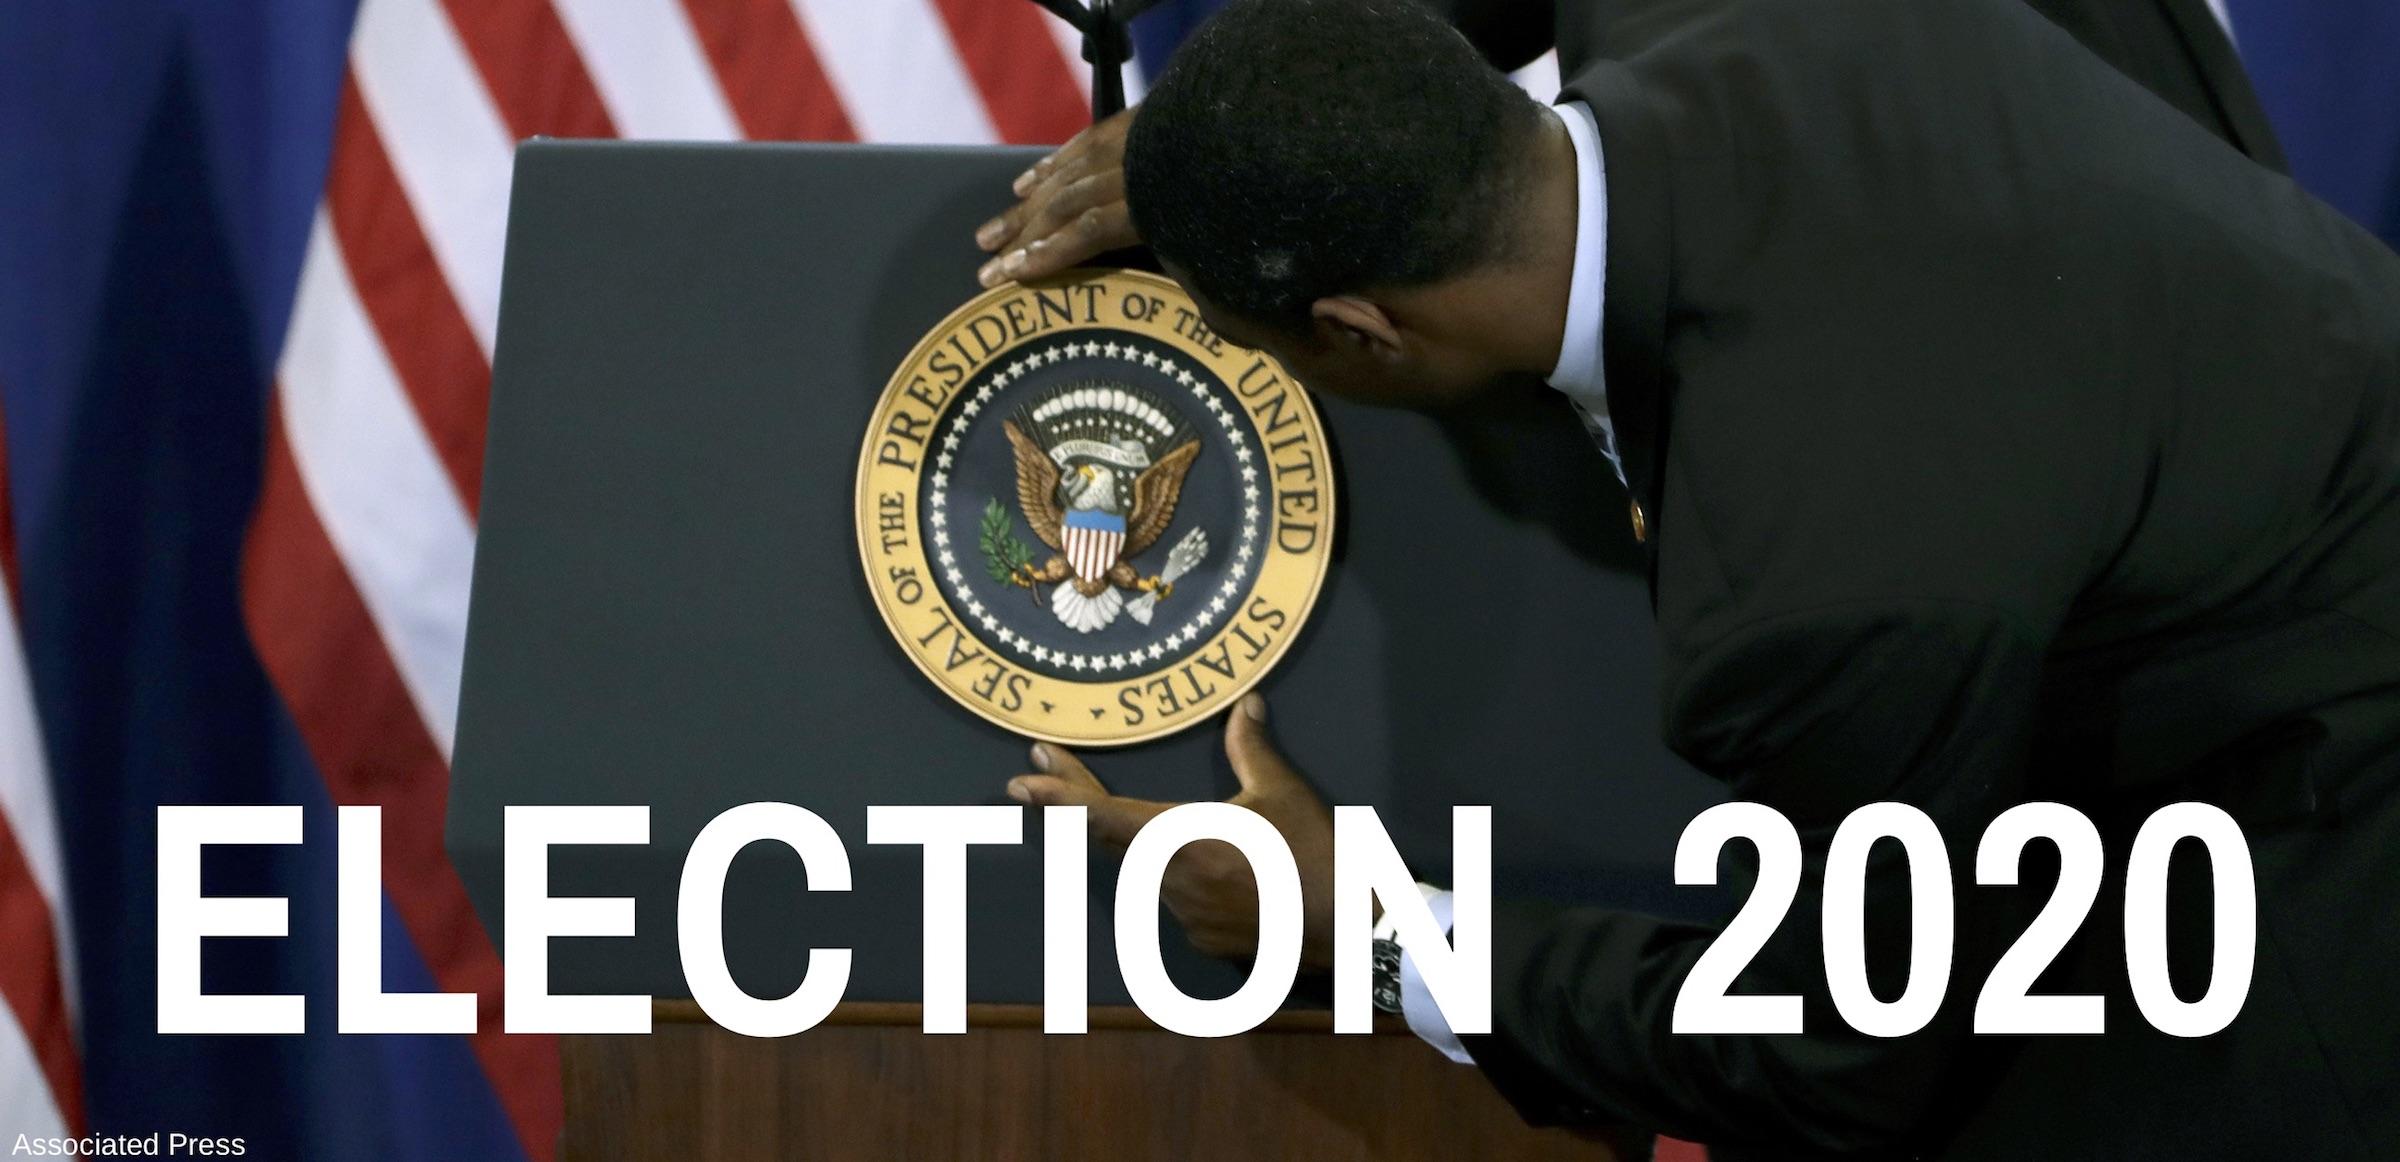 PolitiFact's coverage of Election 2020   PolitiFact